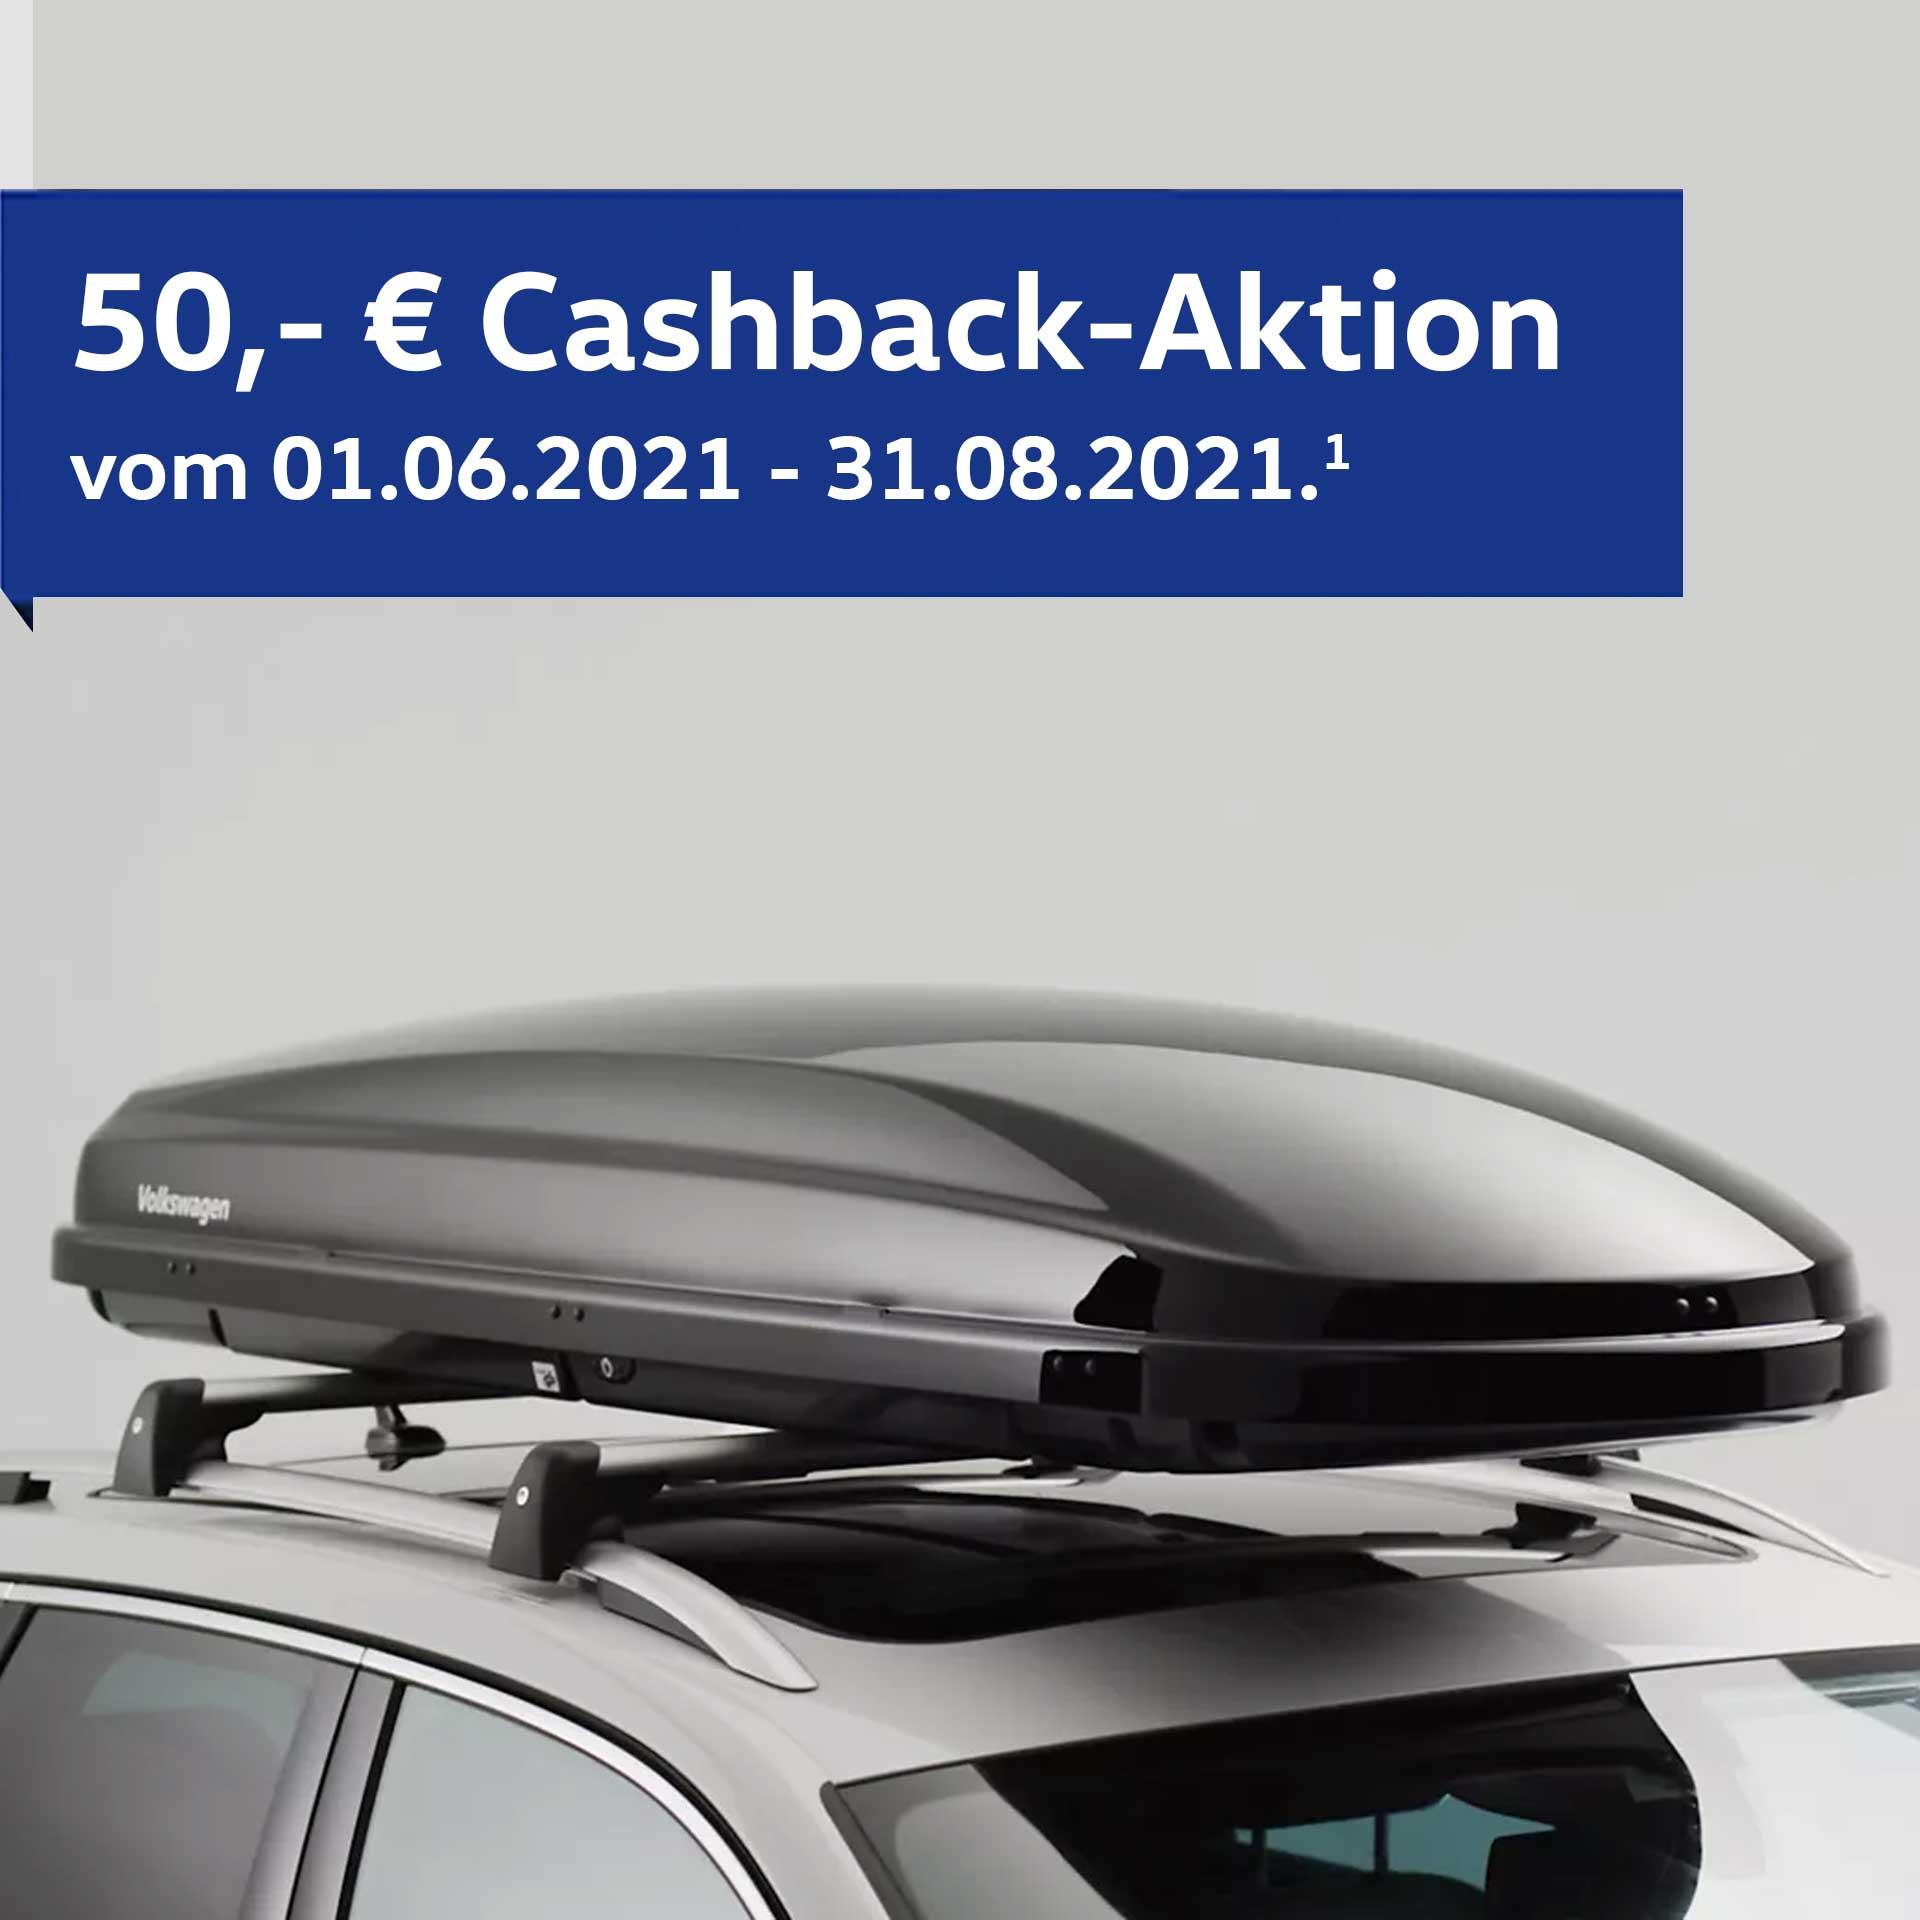 VW Original Comfort Dachbox schwarz 460 l